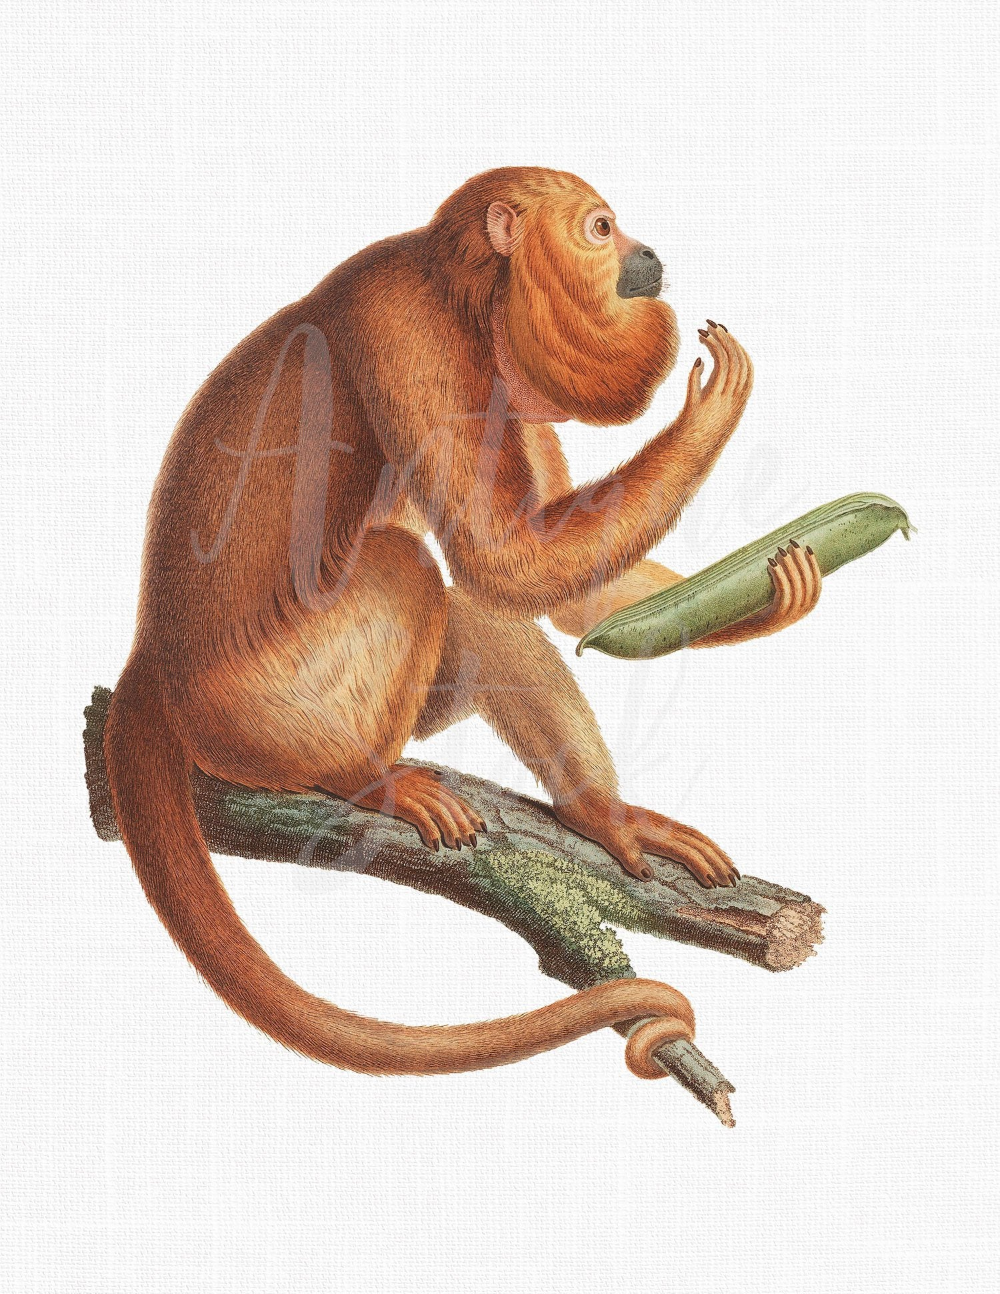 Botanical Download Print Ursine Howler Monkey Etsy Animal Illustration Monkey Illustration Scientific Illustration